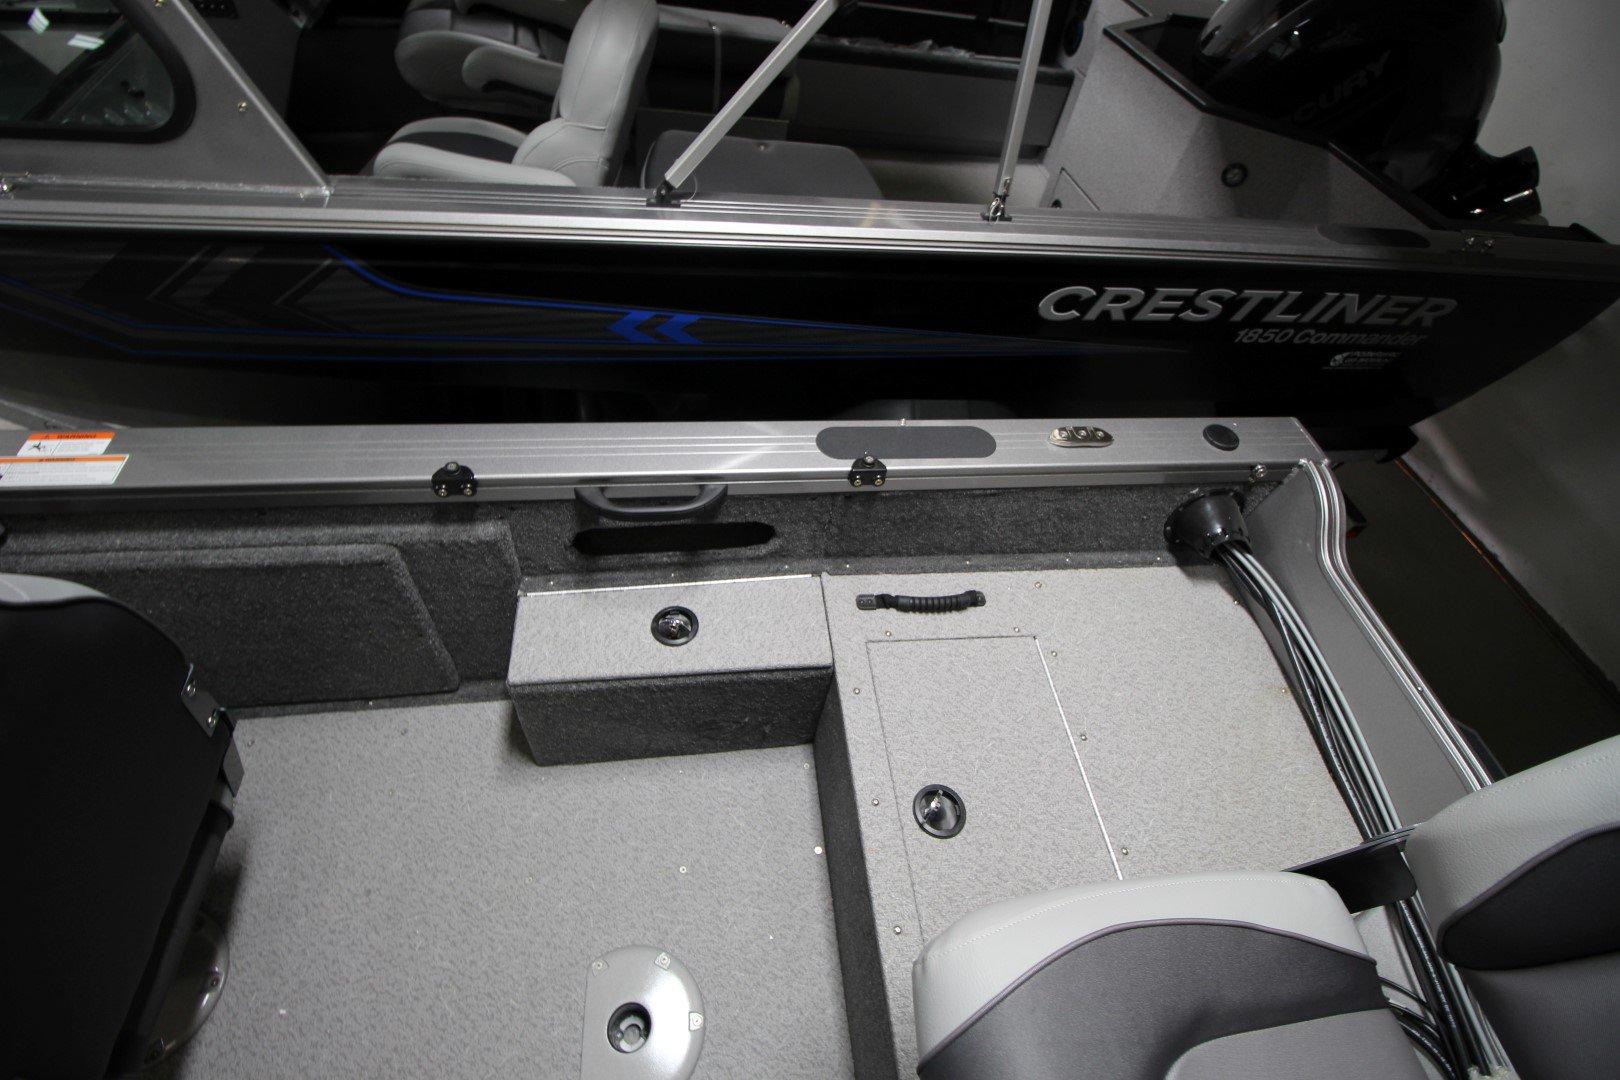 Crestliner FishHawk 1750 WT - IMG_2187